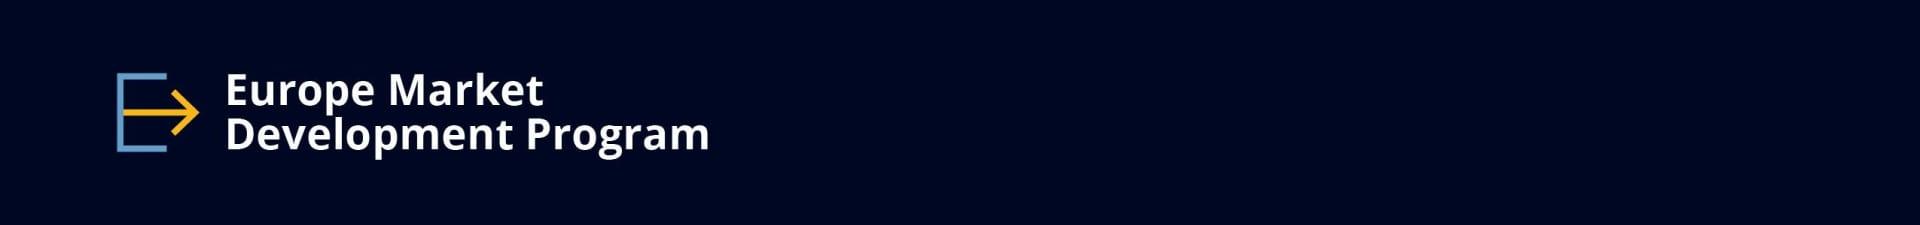 ACOC_Web_03.jpg